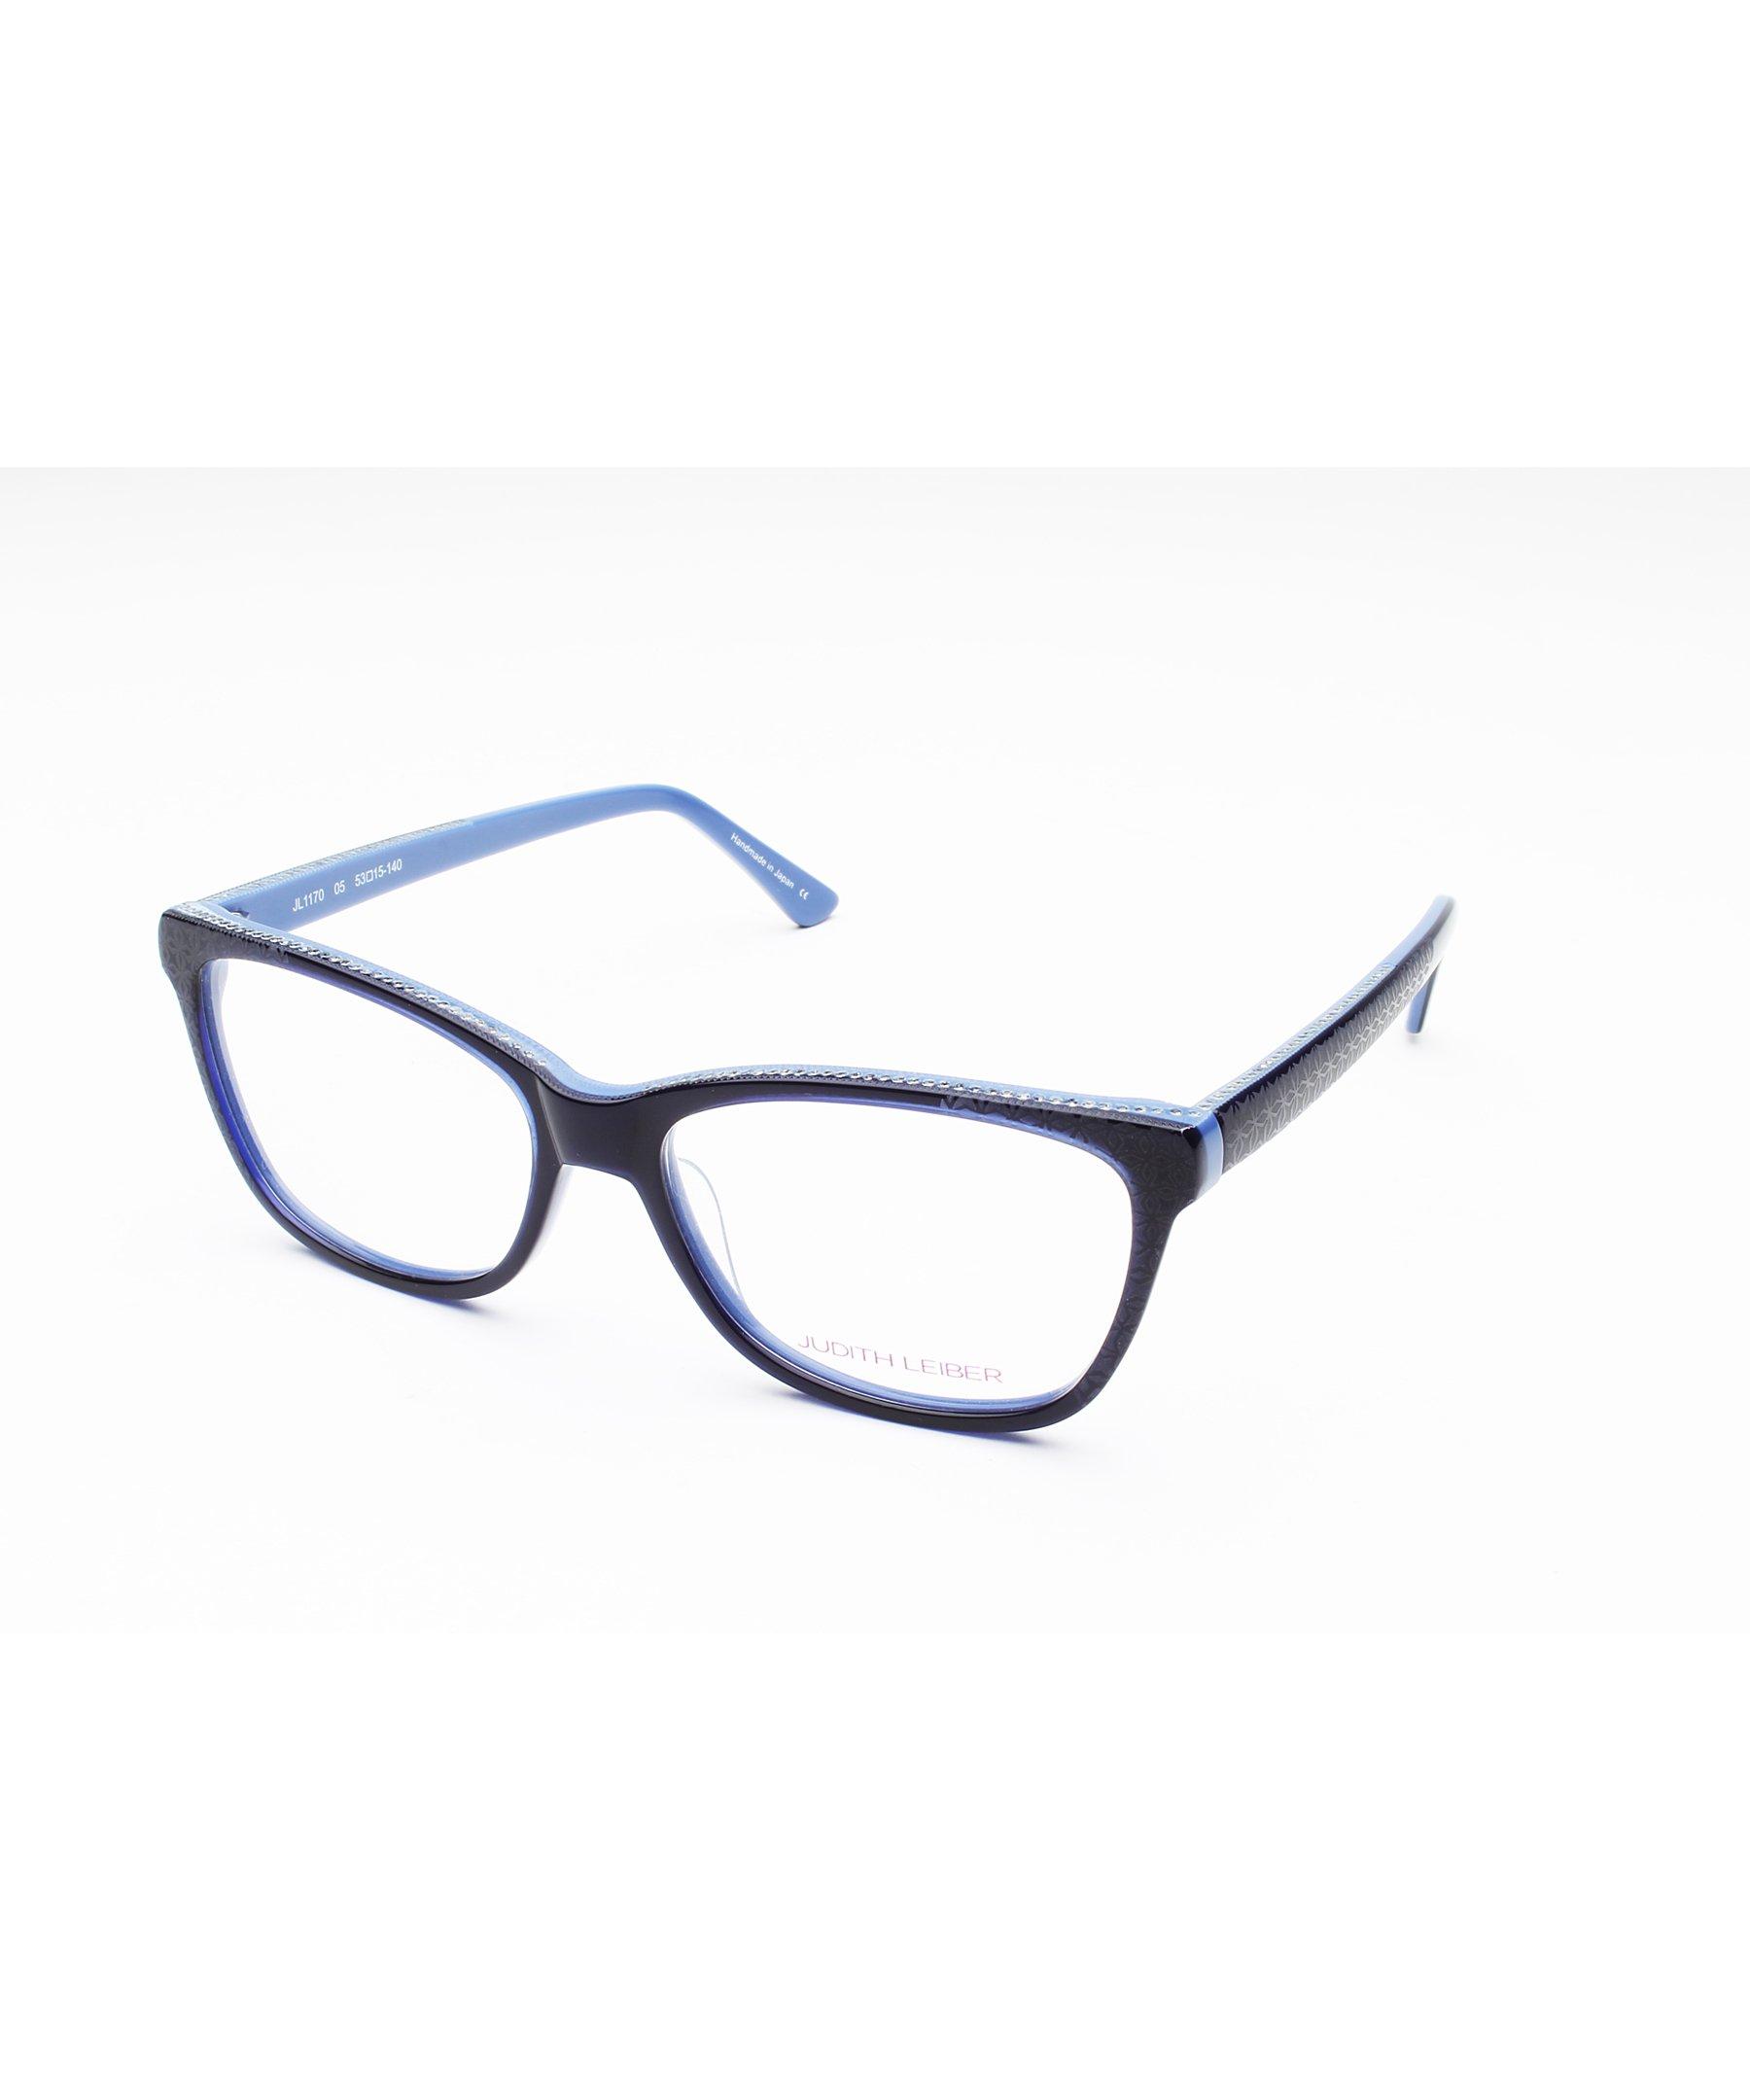 Judith leiber Classics Eyeglasses in Blue Lyst